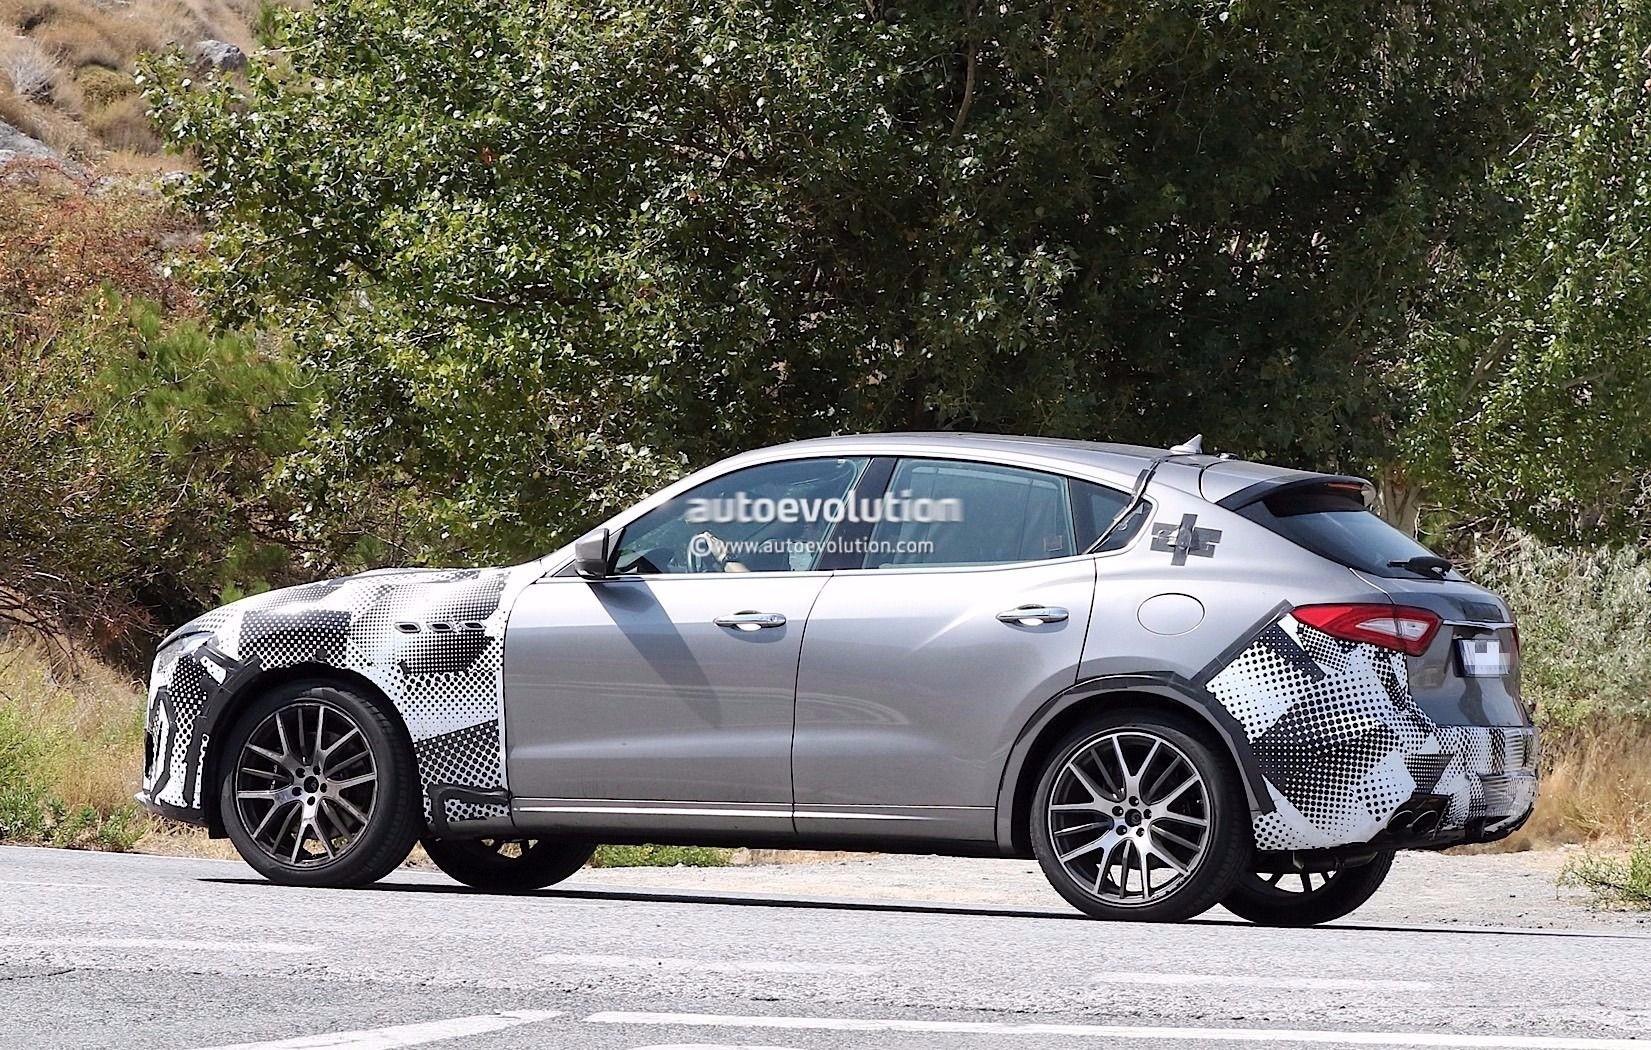 Spyshots 2018 Maserati Levante Gts With V8 Power Tests